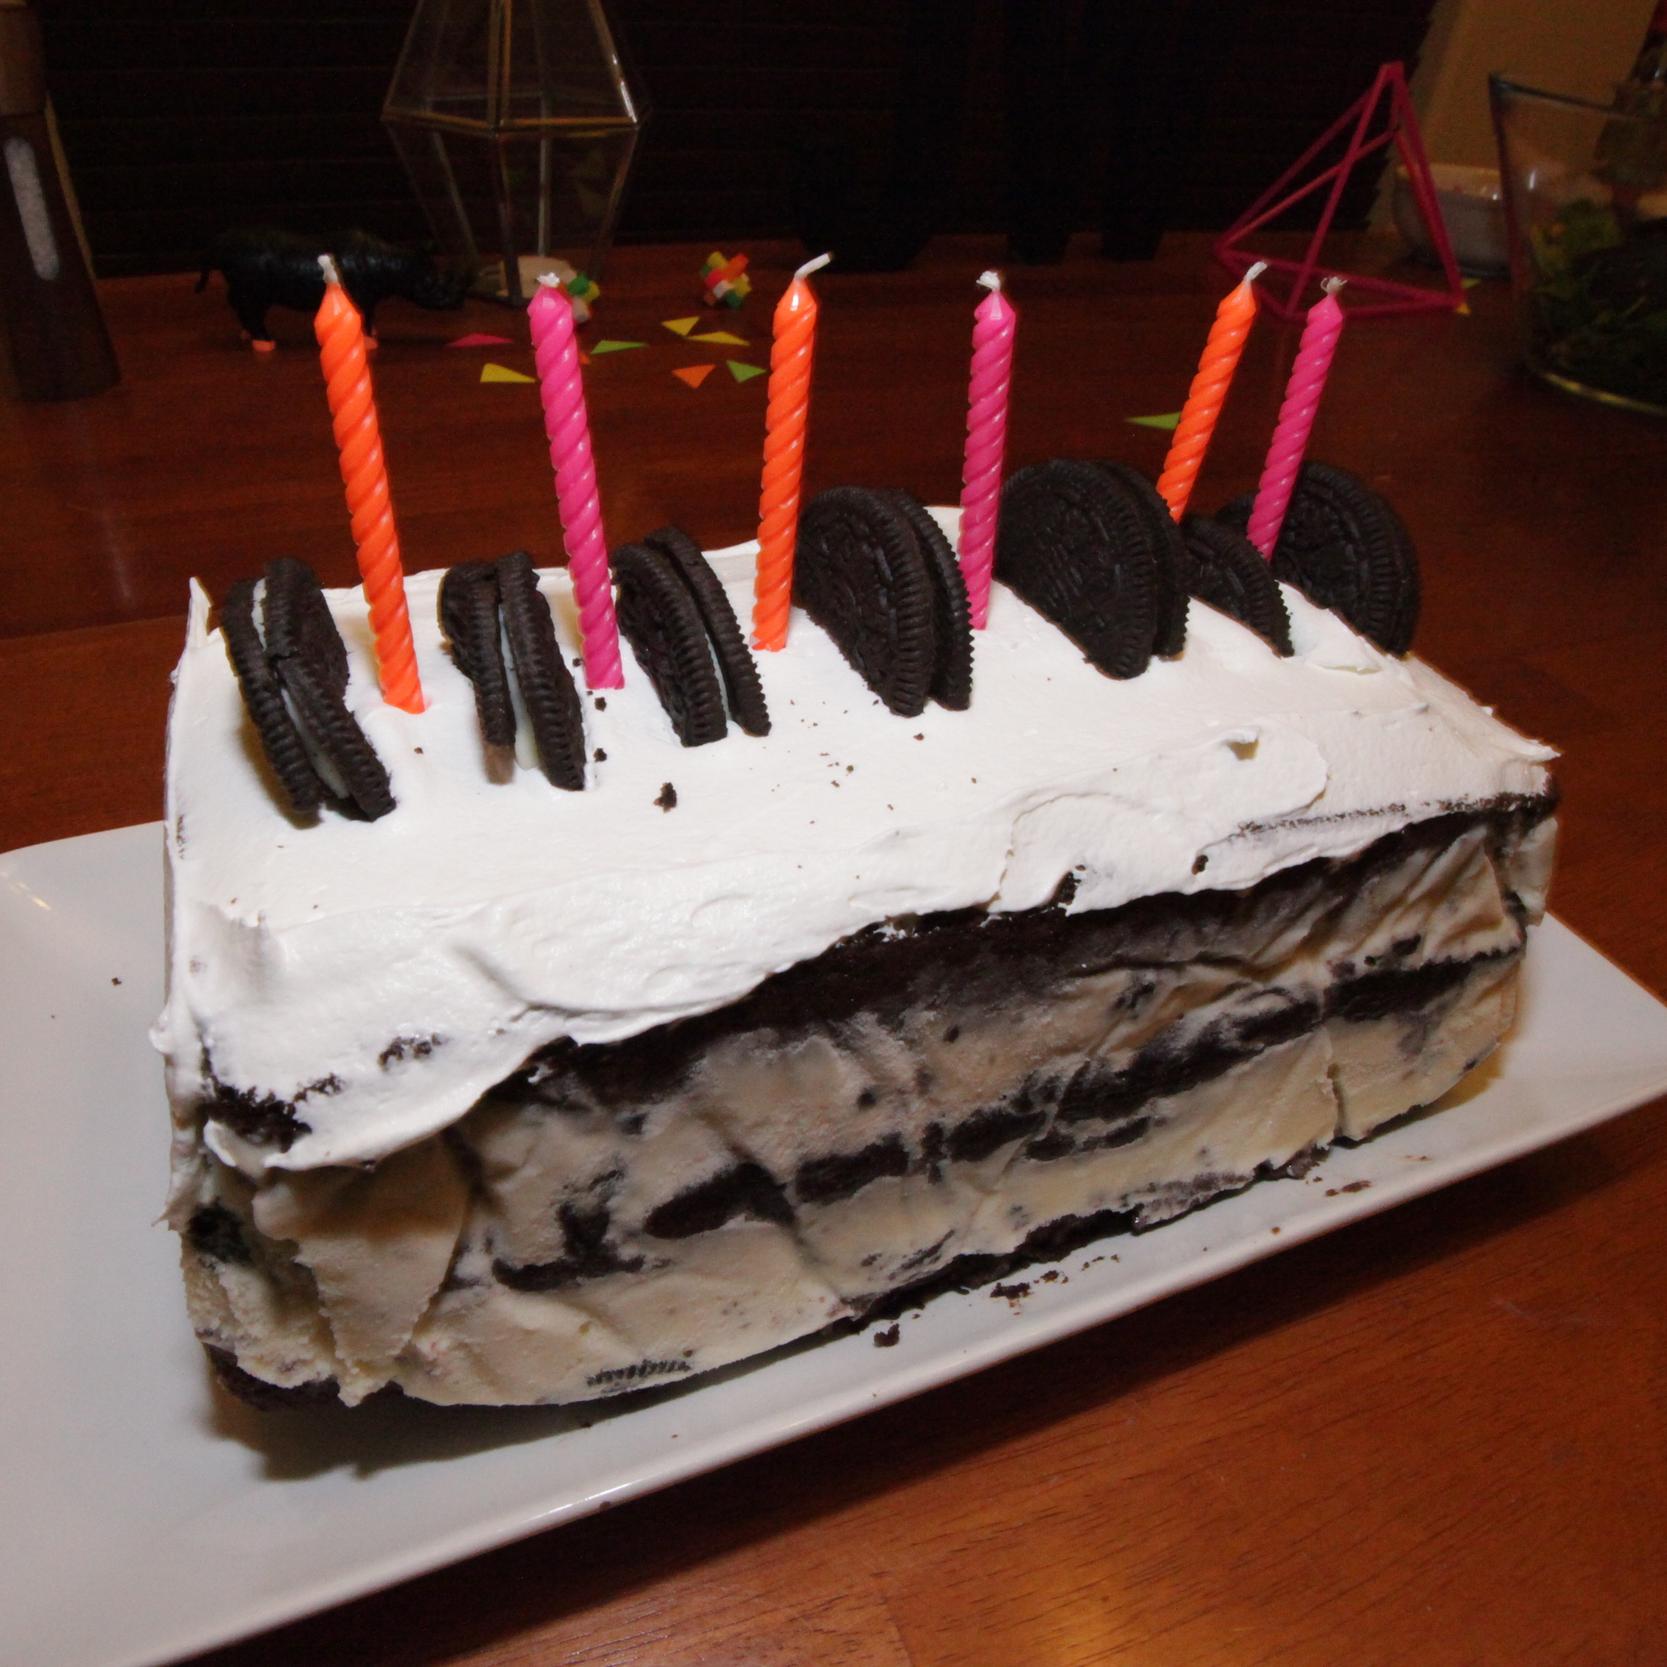 HOMEMADE OREO ICE CREAM BDAY CAKE. - MAR. 2015